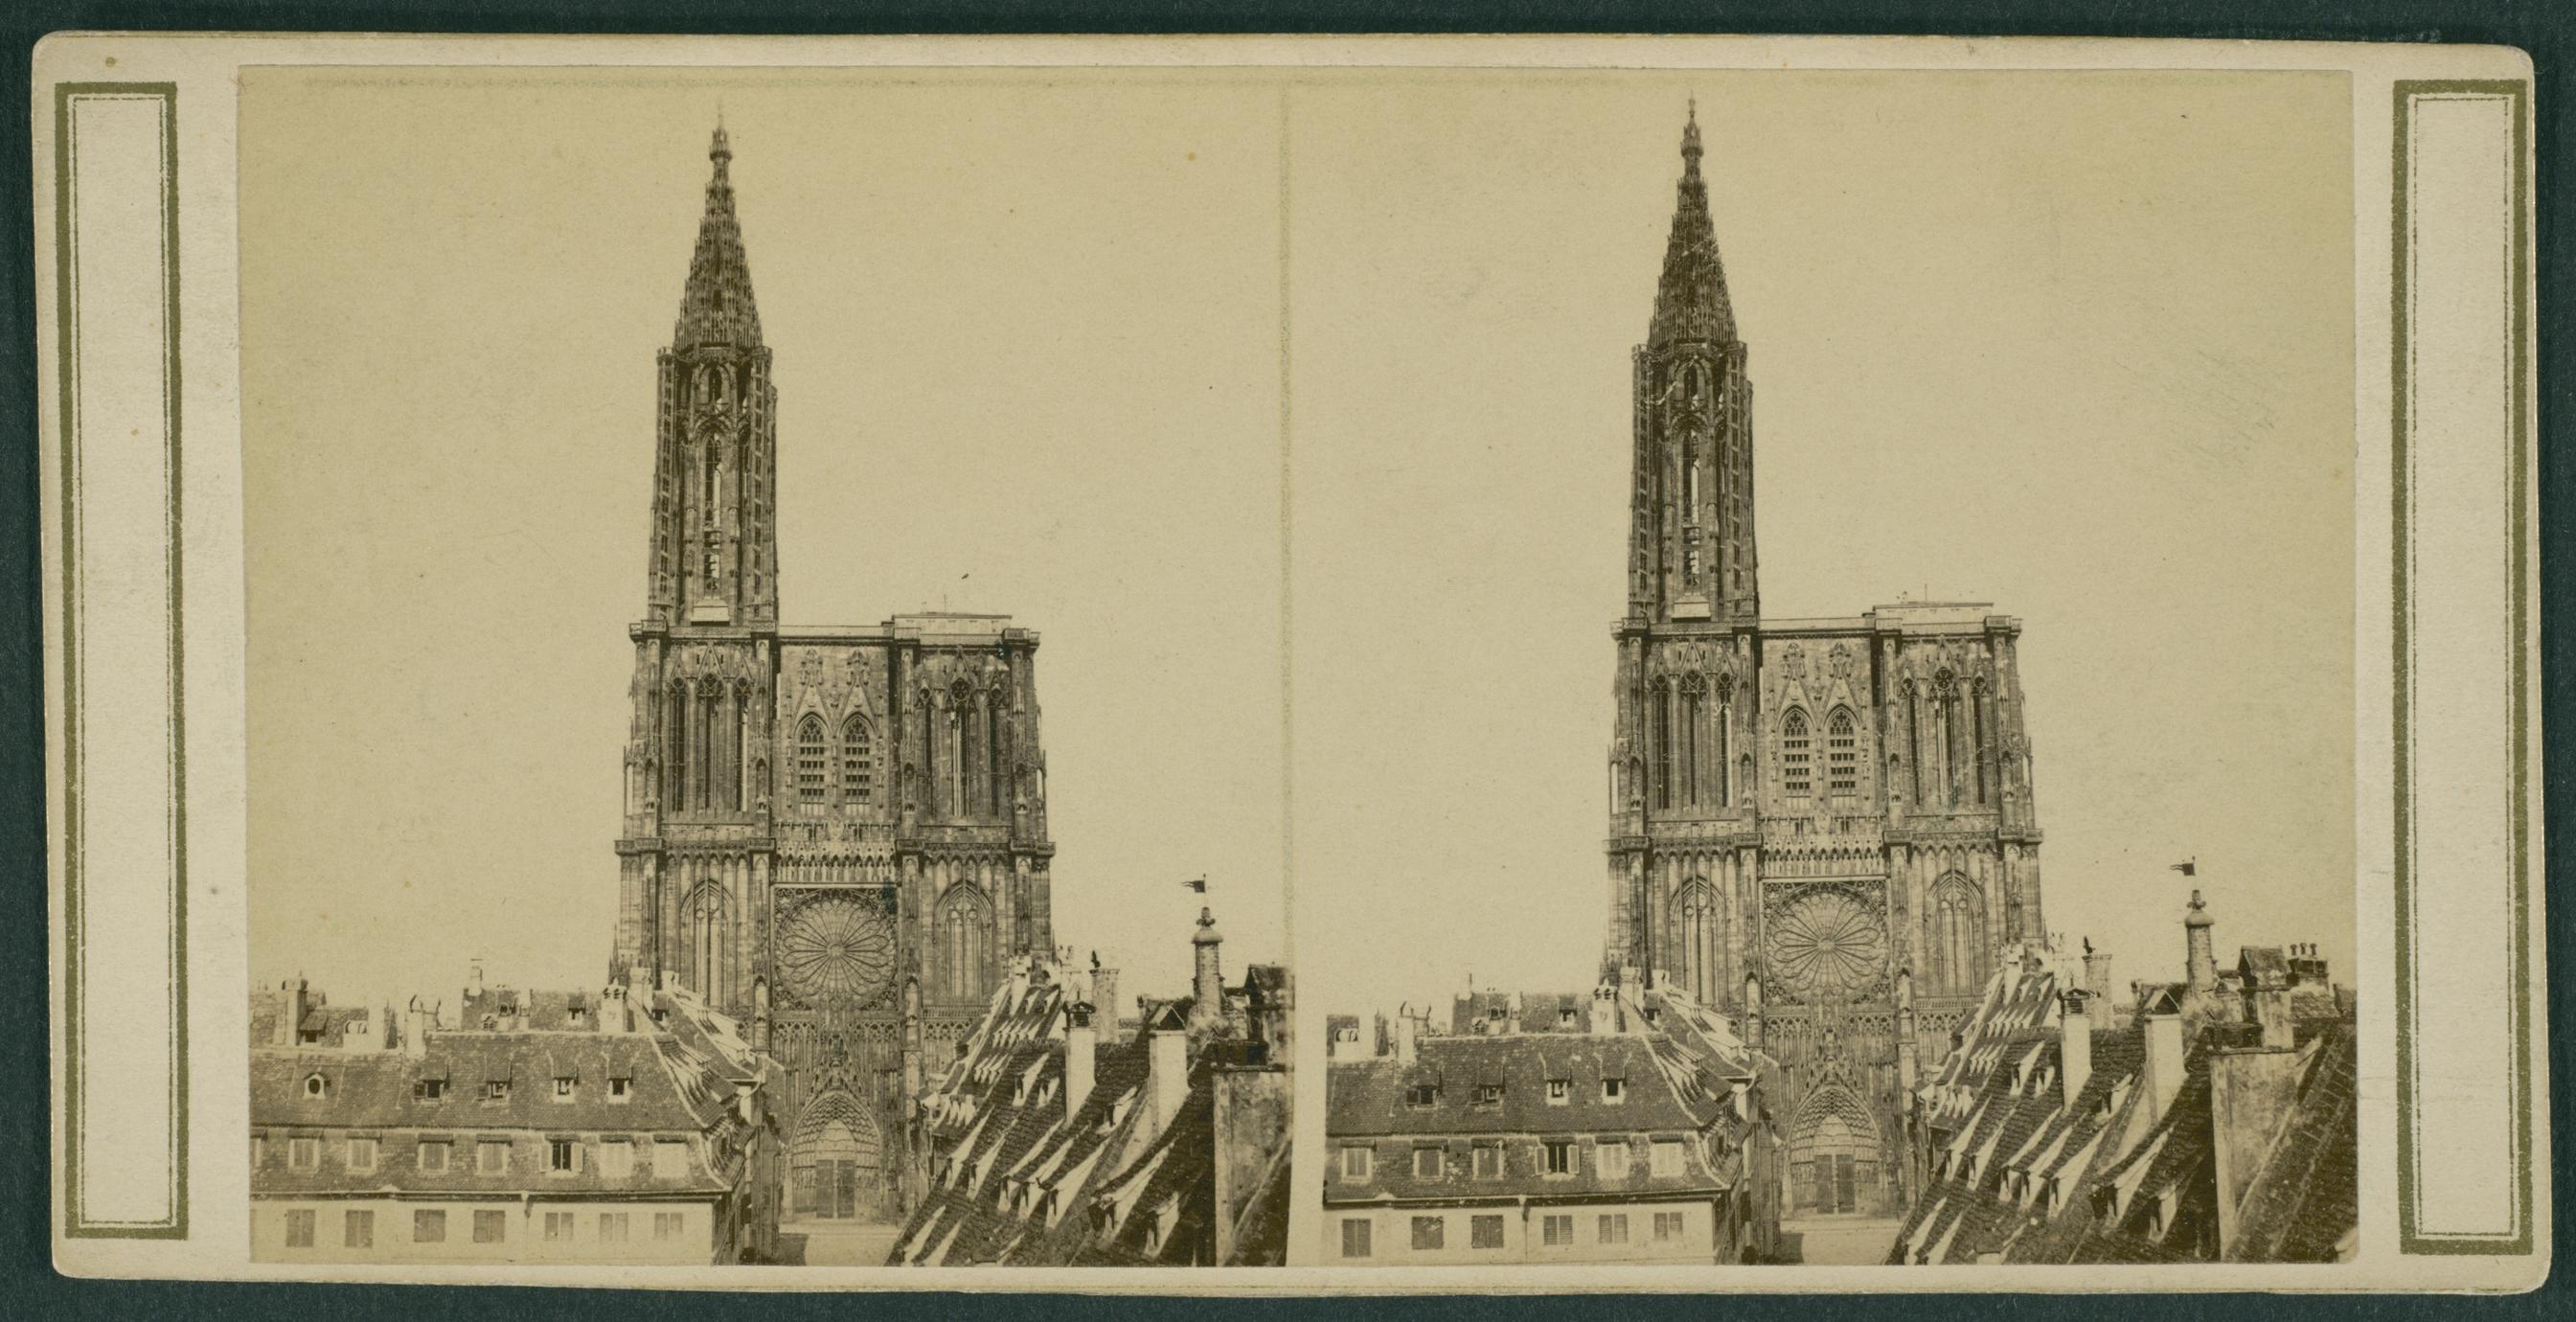 Strasbourg, June 14th, 1866. J. M. Hubbard (1 of 3)